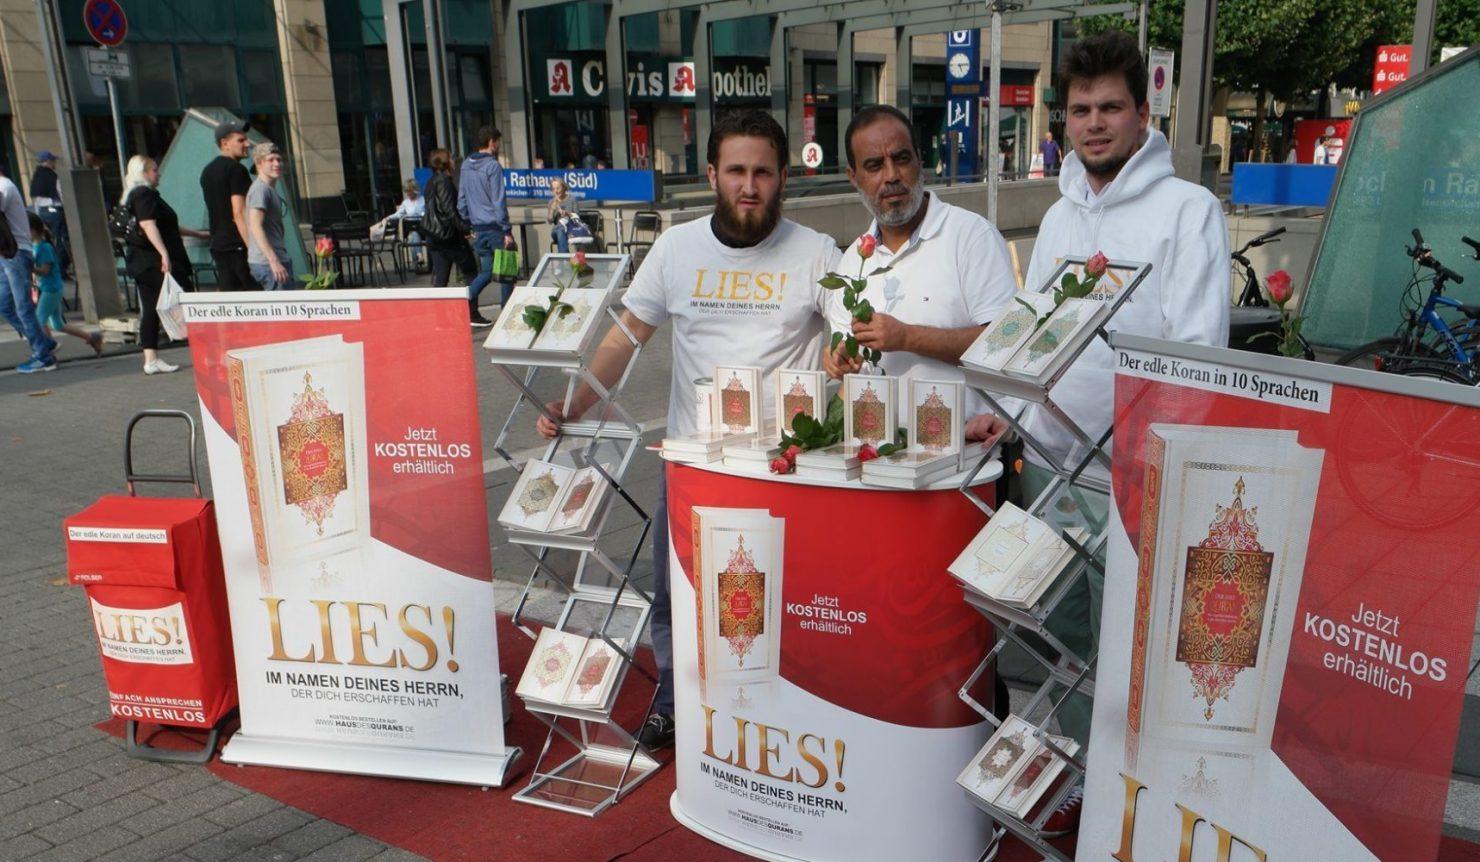 lies-campaign